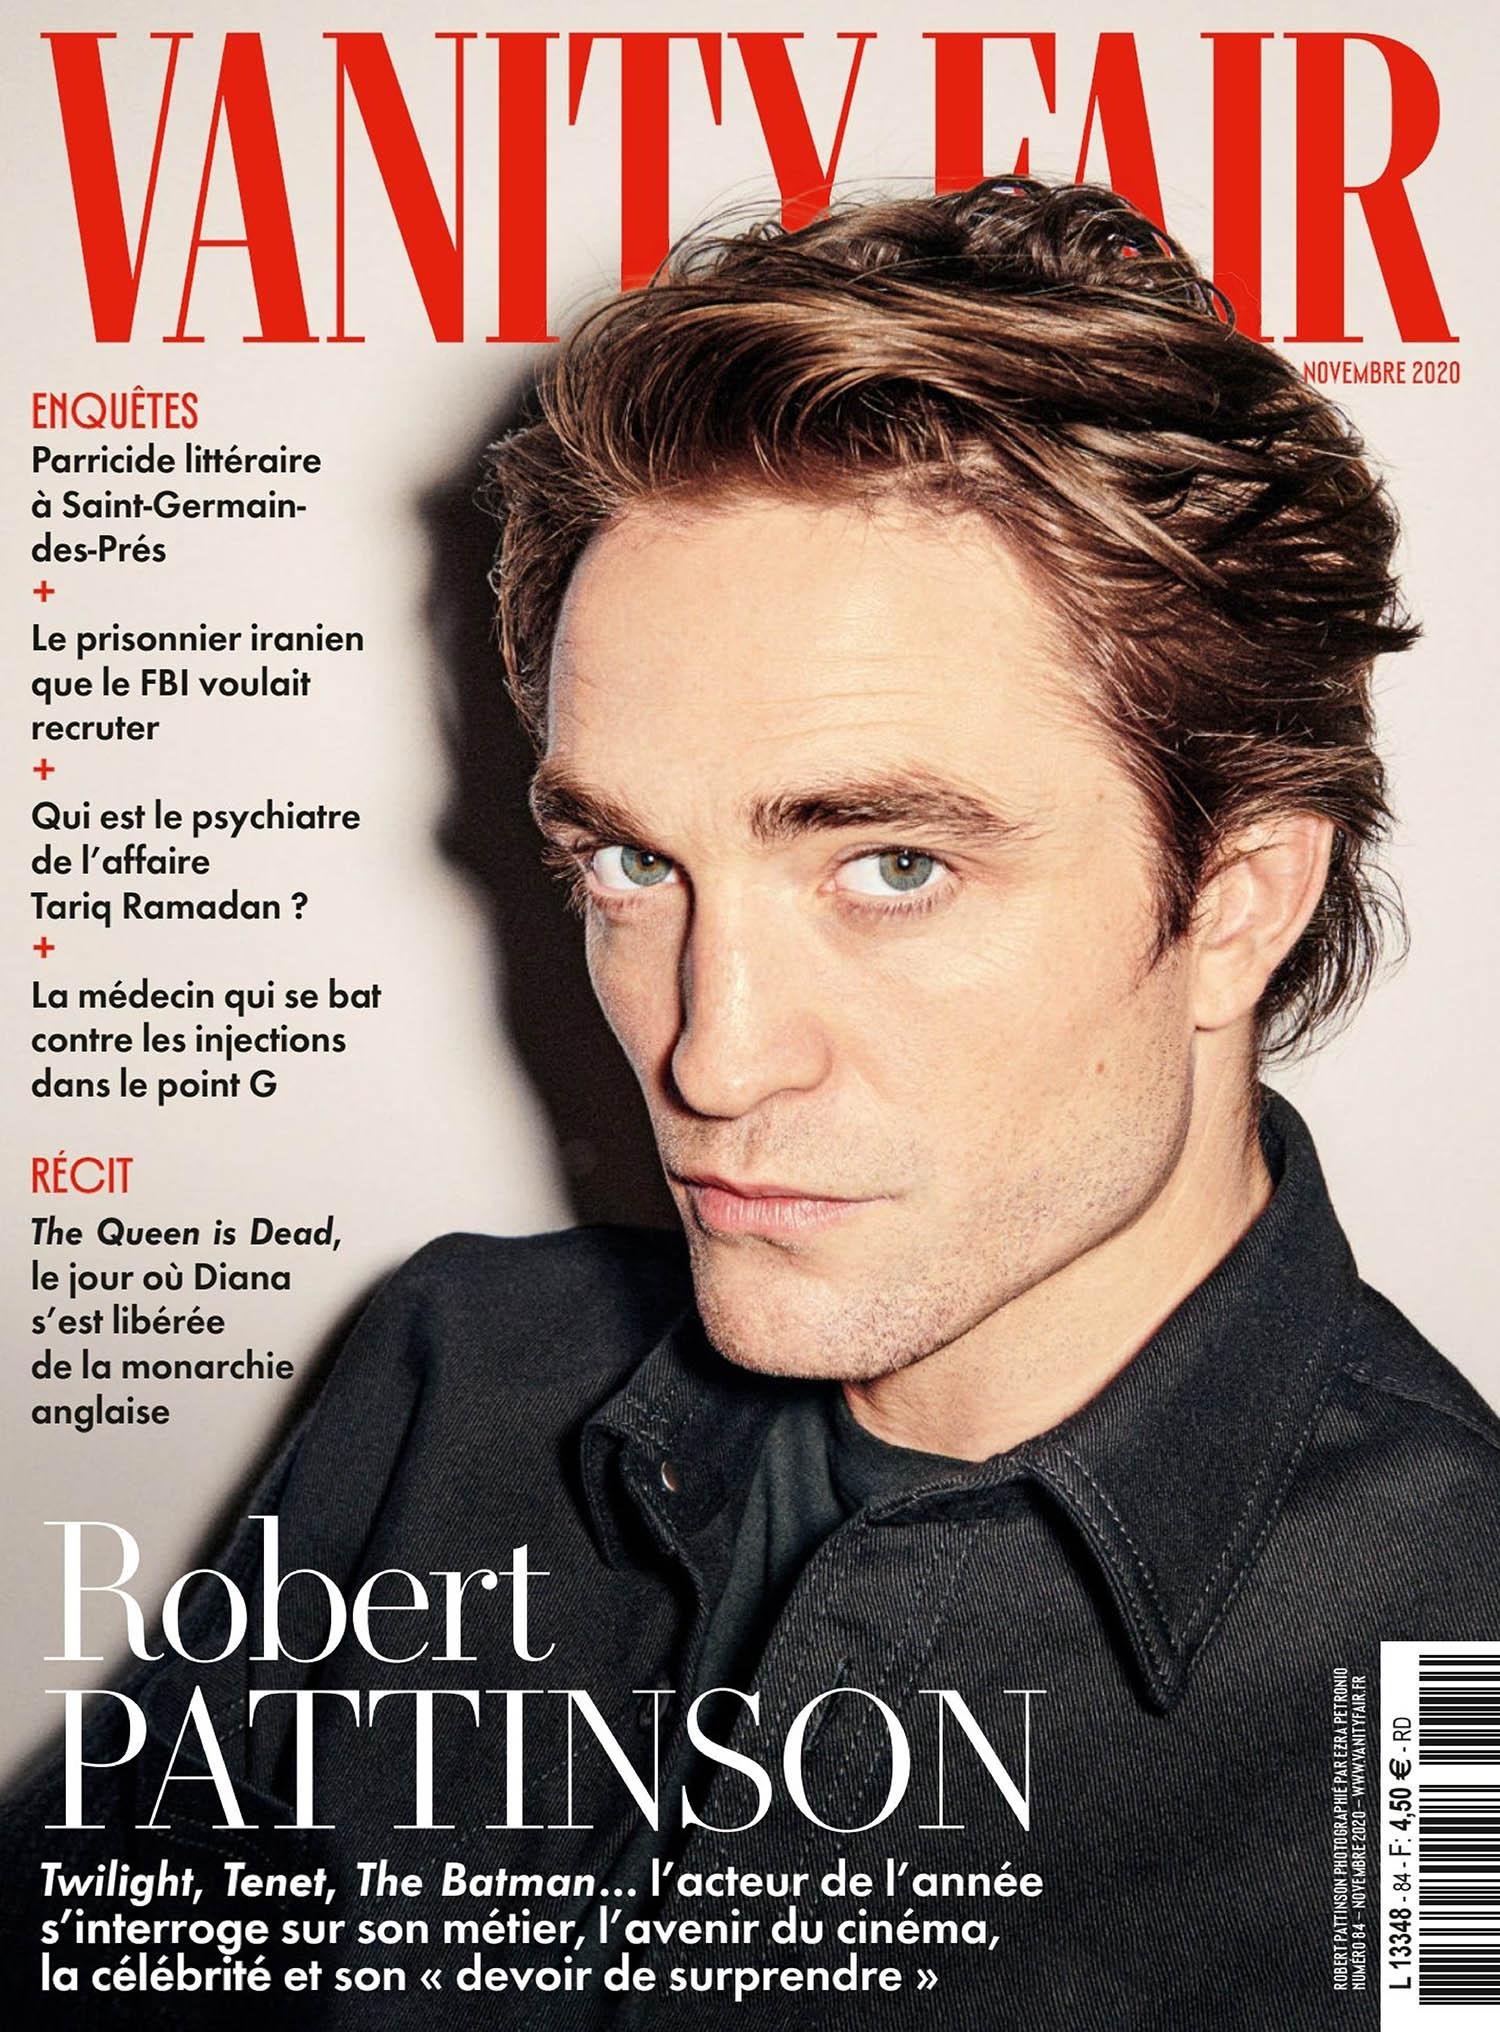 Robert Pattinson covers Vanity Fair France November 2020 by Ezra Petronio